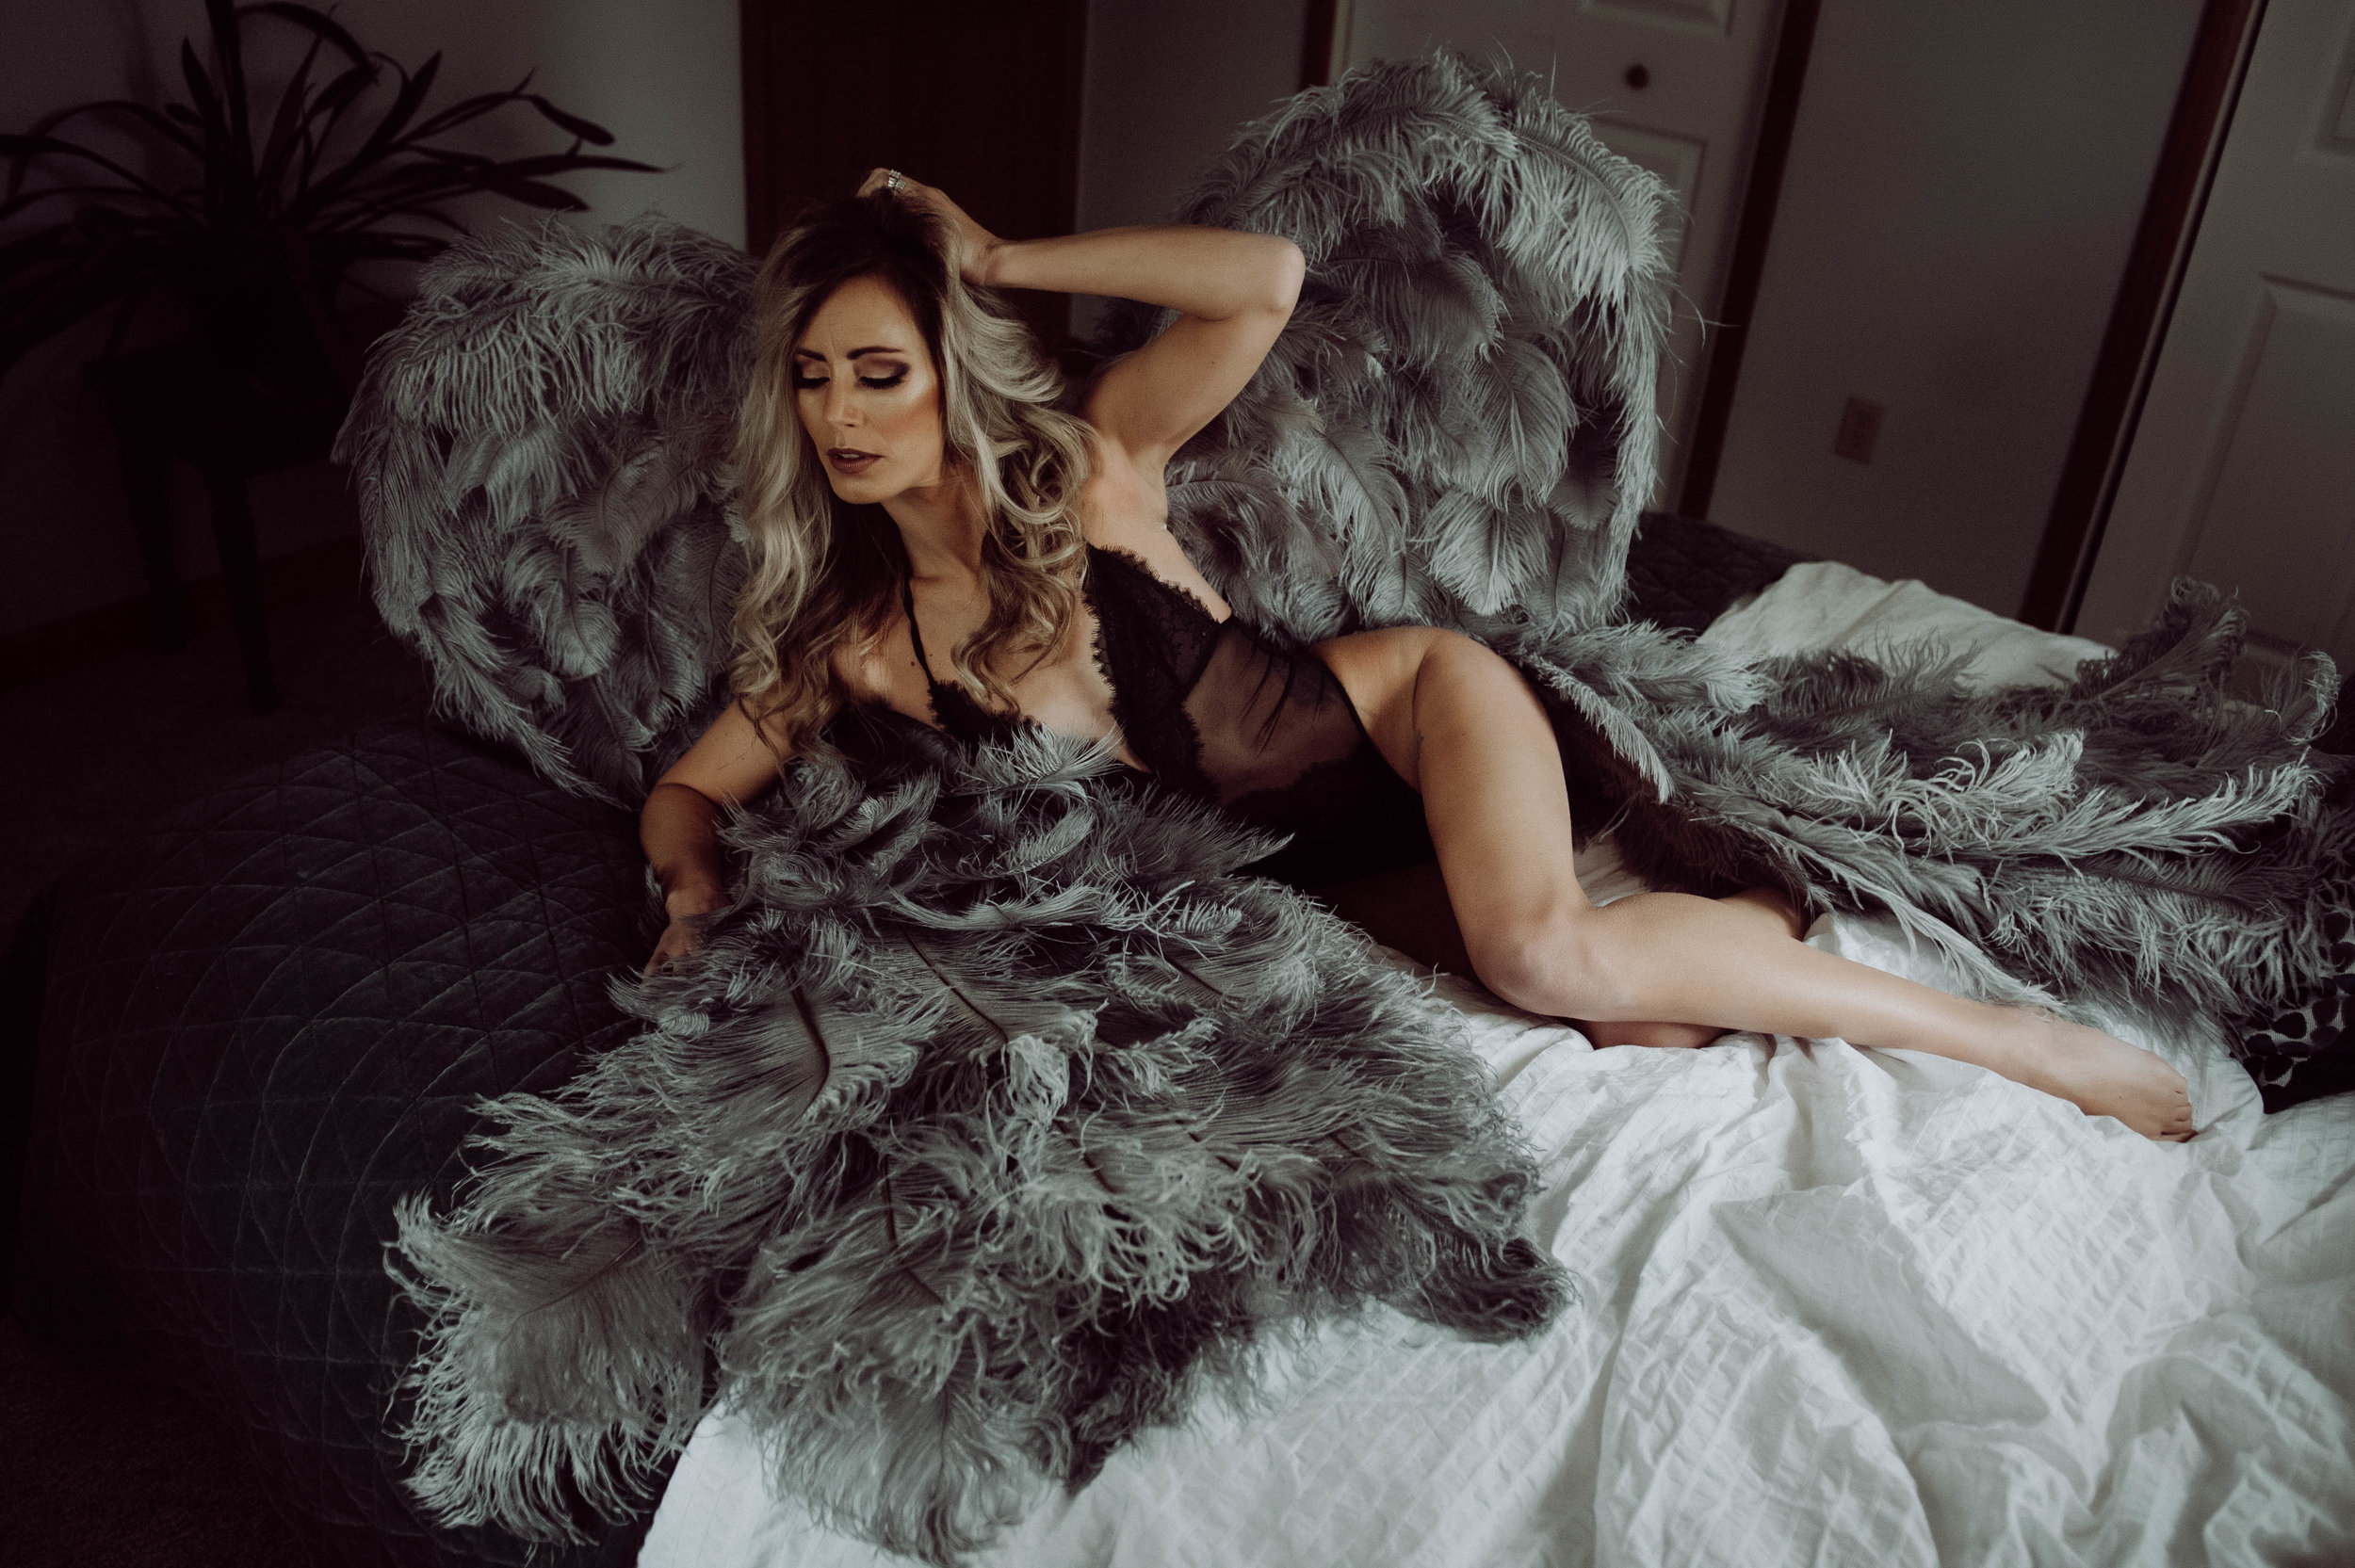 Blonde woman in black bodysuit gray angel wings  boudoir photography new york city bedroom